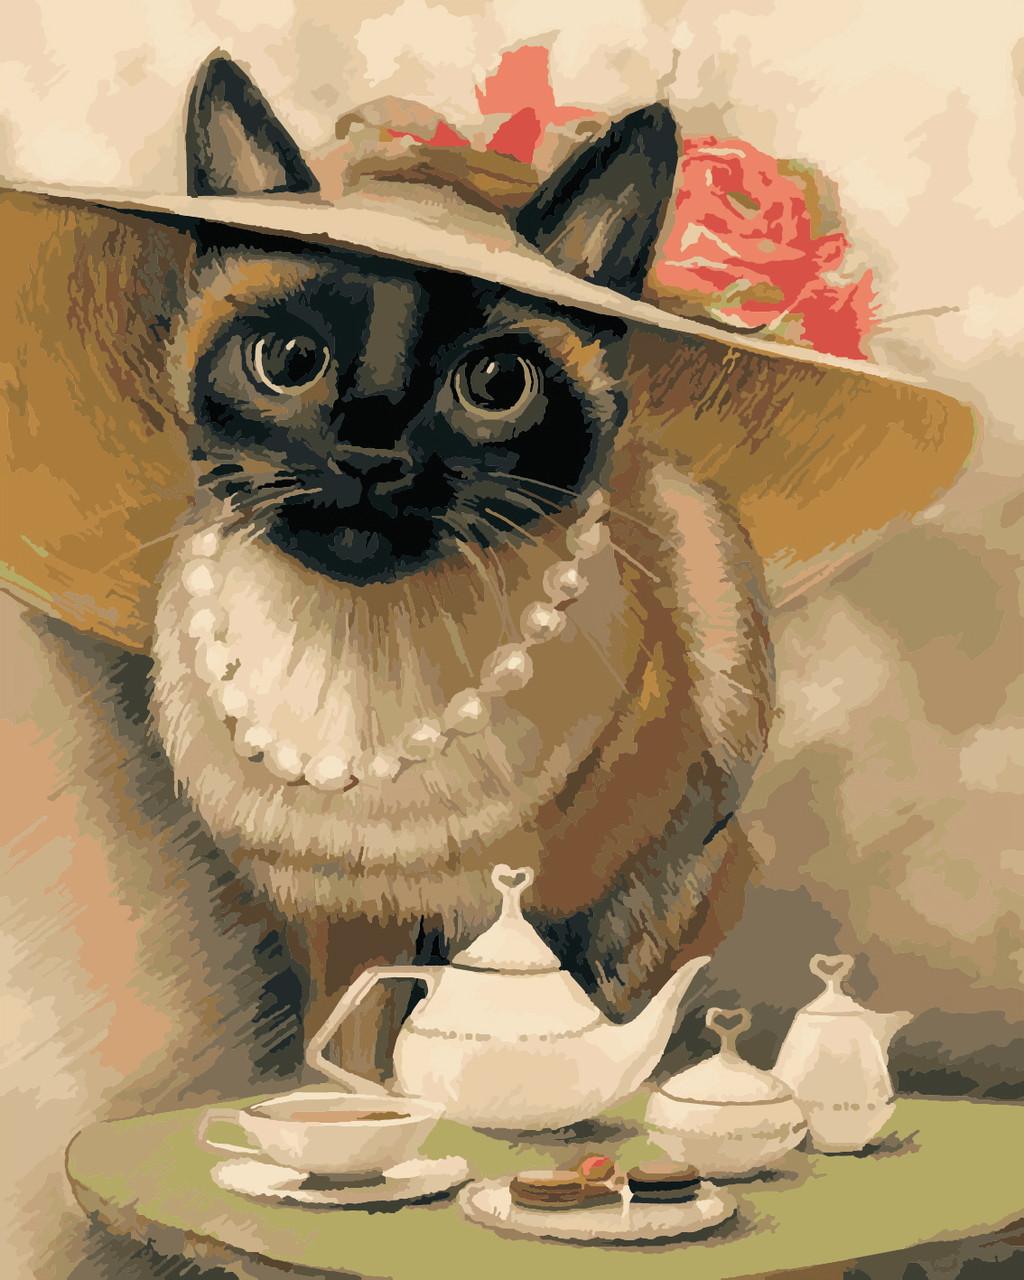 Художественный творческий набор, картина по номерам Леди-кошка, 40x50 см, «Art Story» (AS0391)